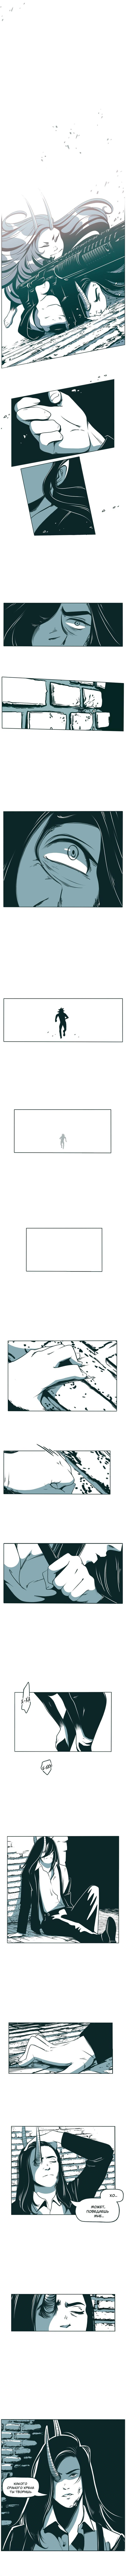 https://r1.ninemanga.com/comics/pic2/0/33536/420922/1534437758260.jpg Page 4